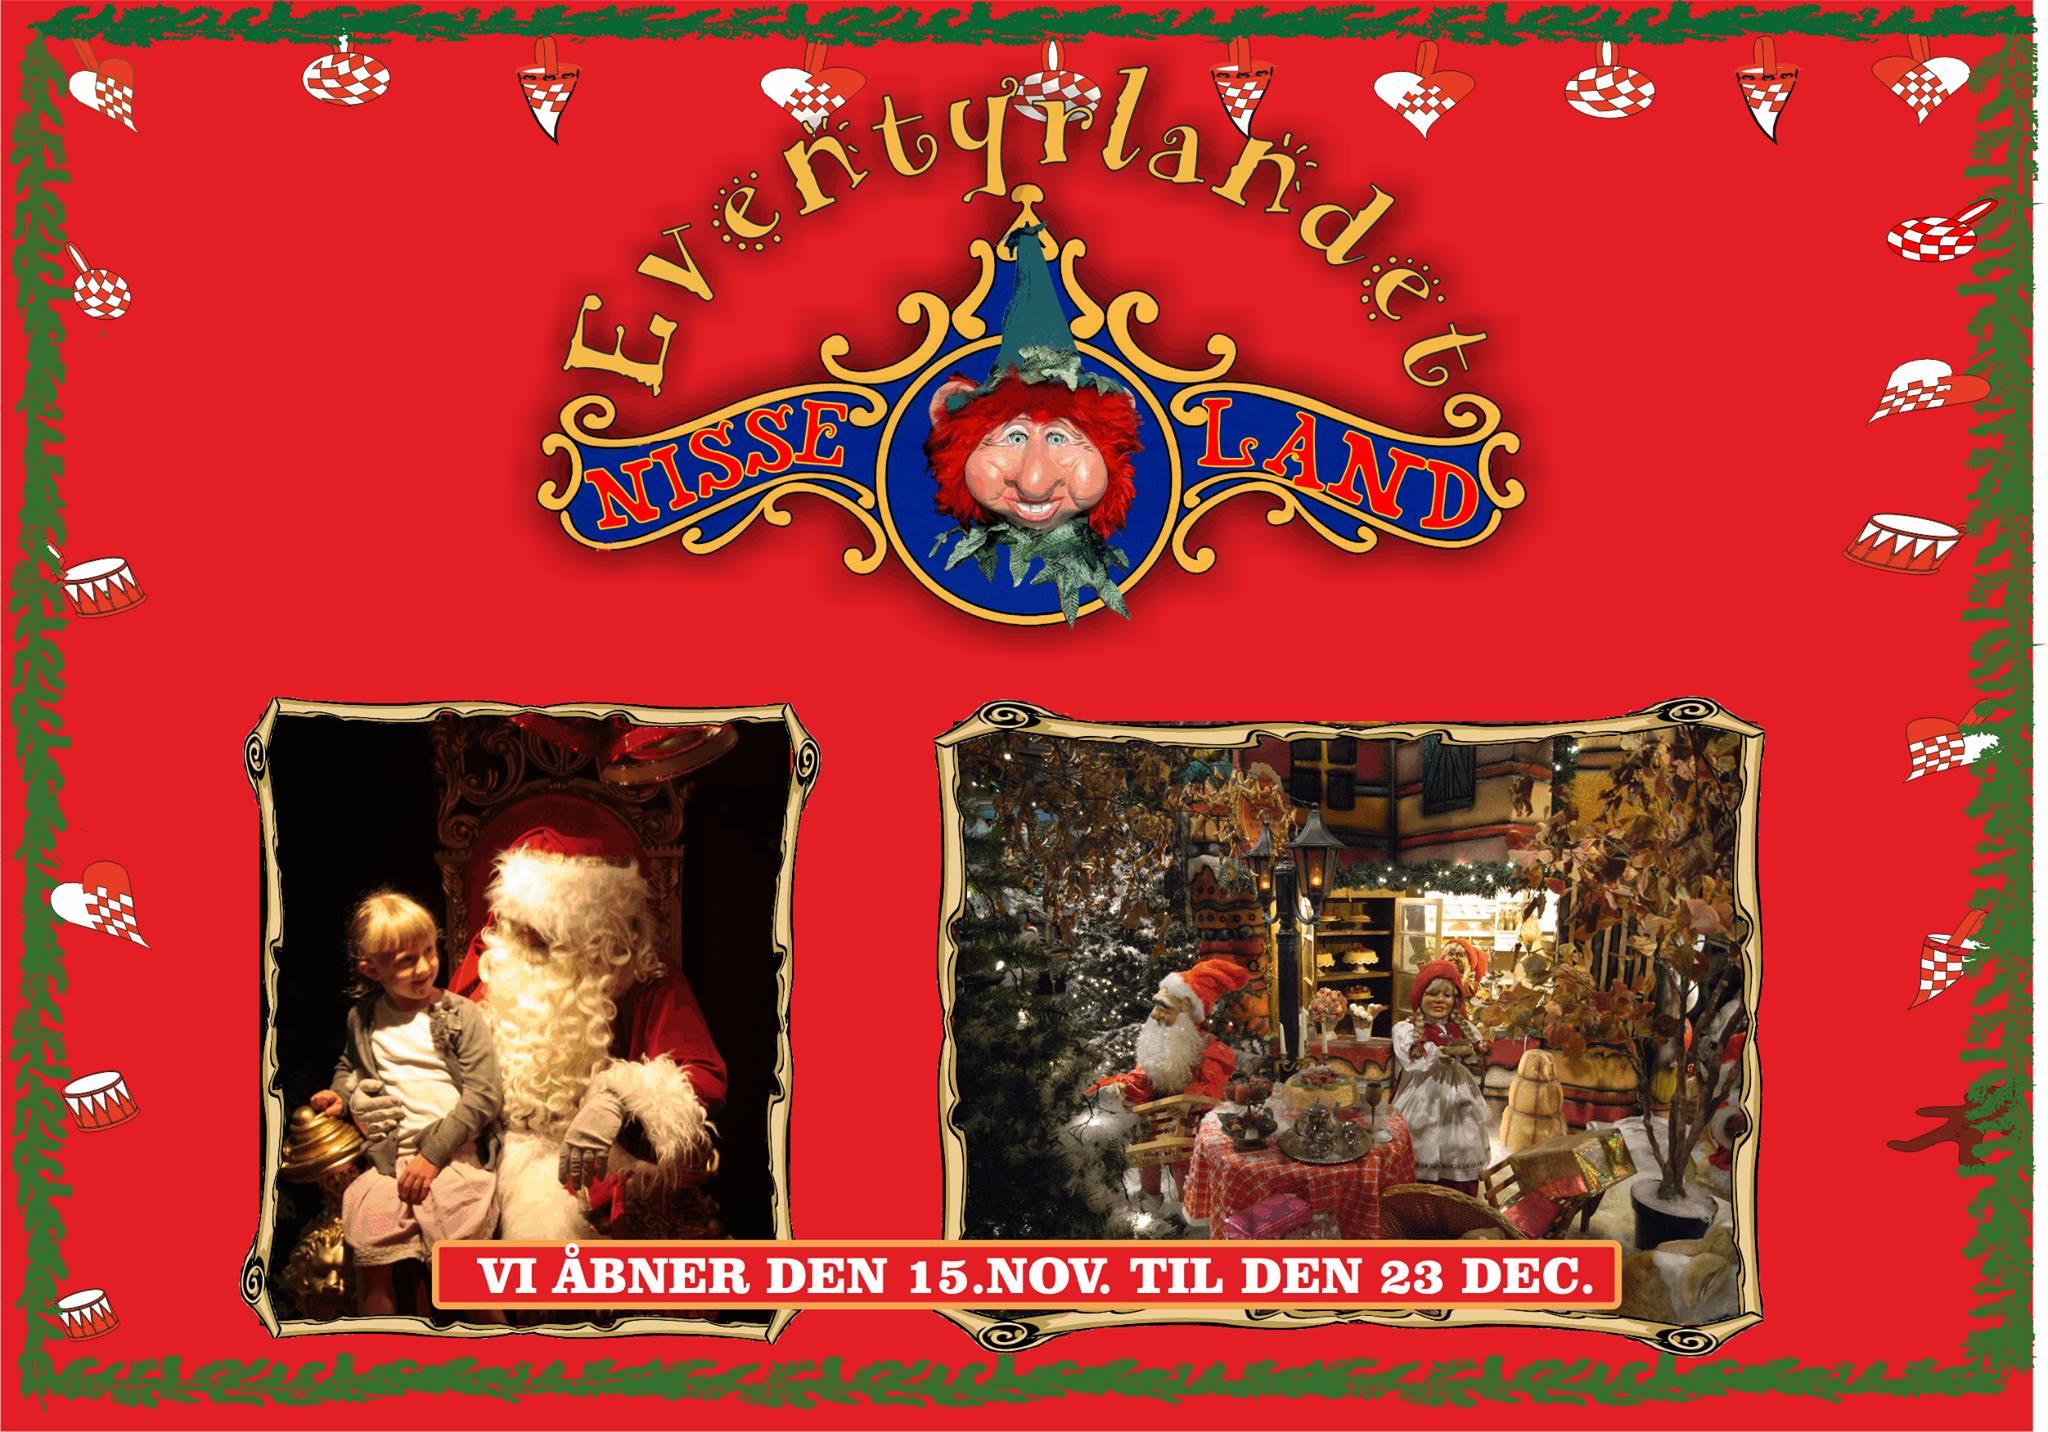 Nisseland brochure - Julemand